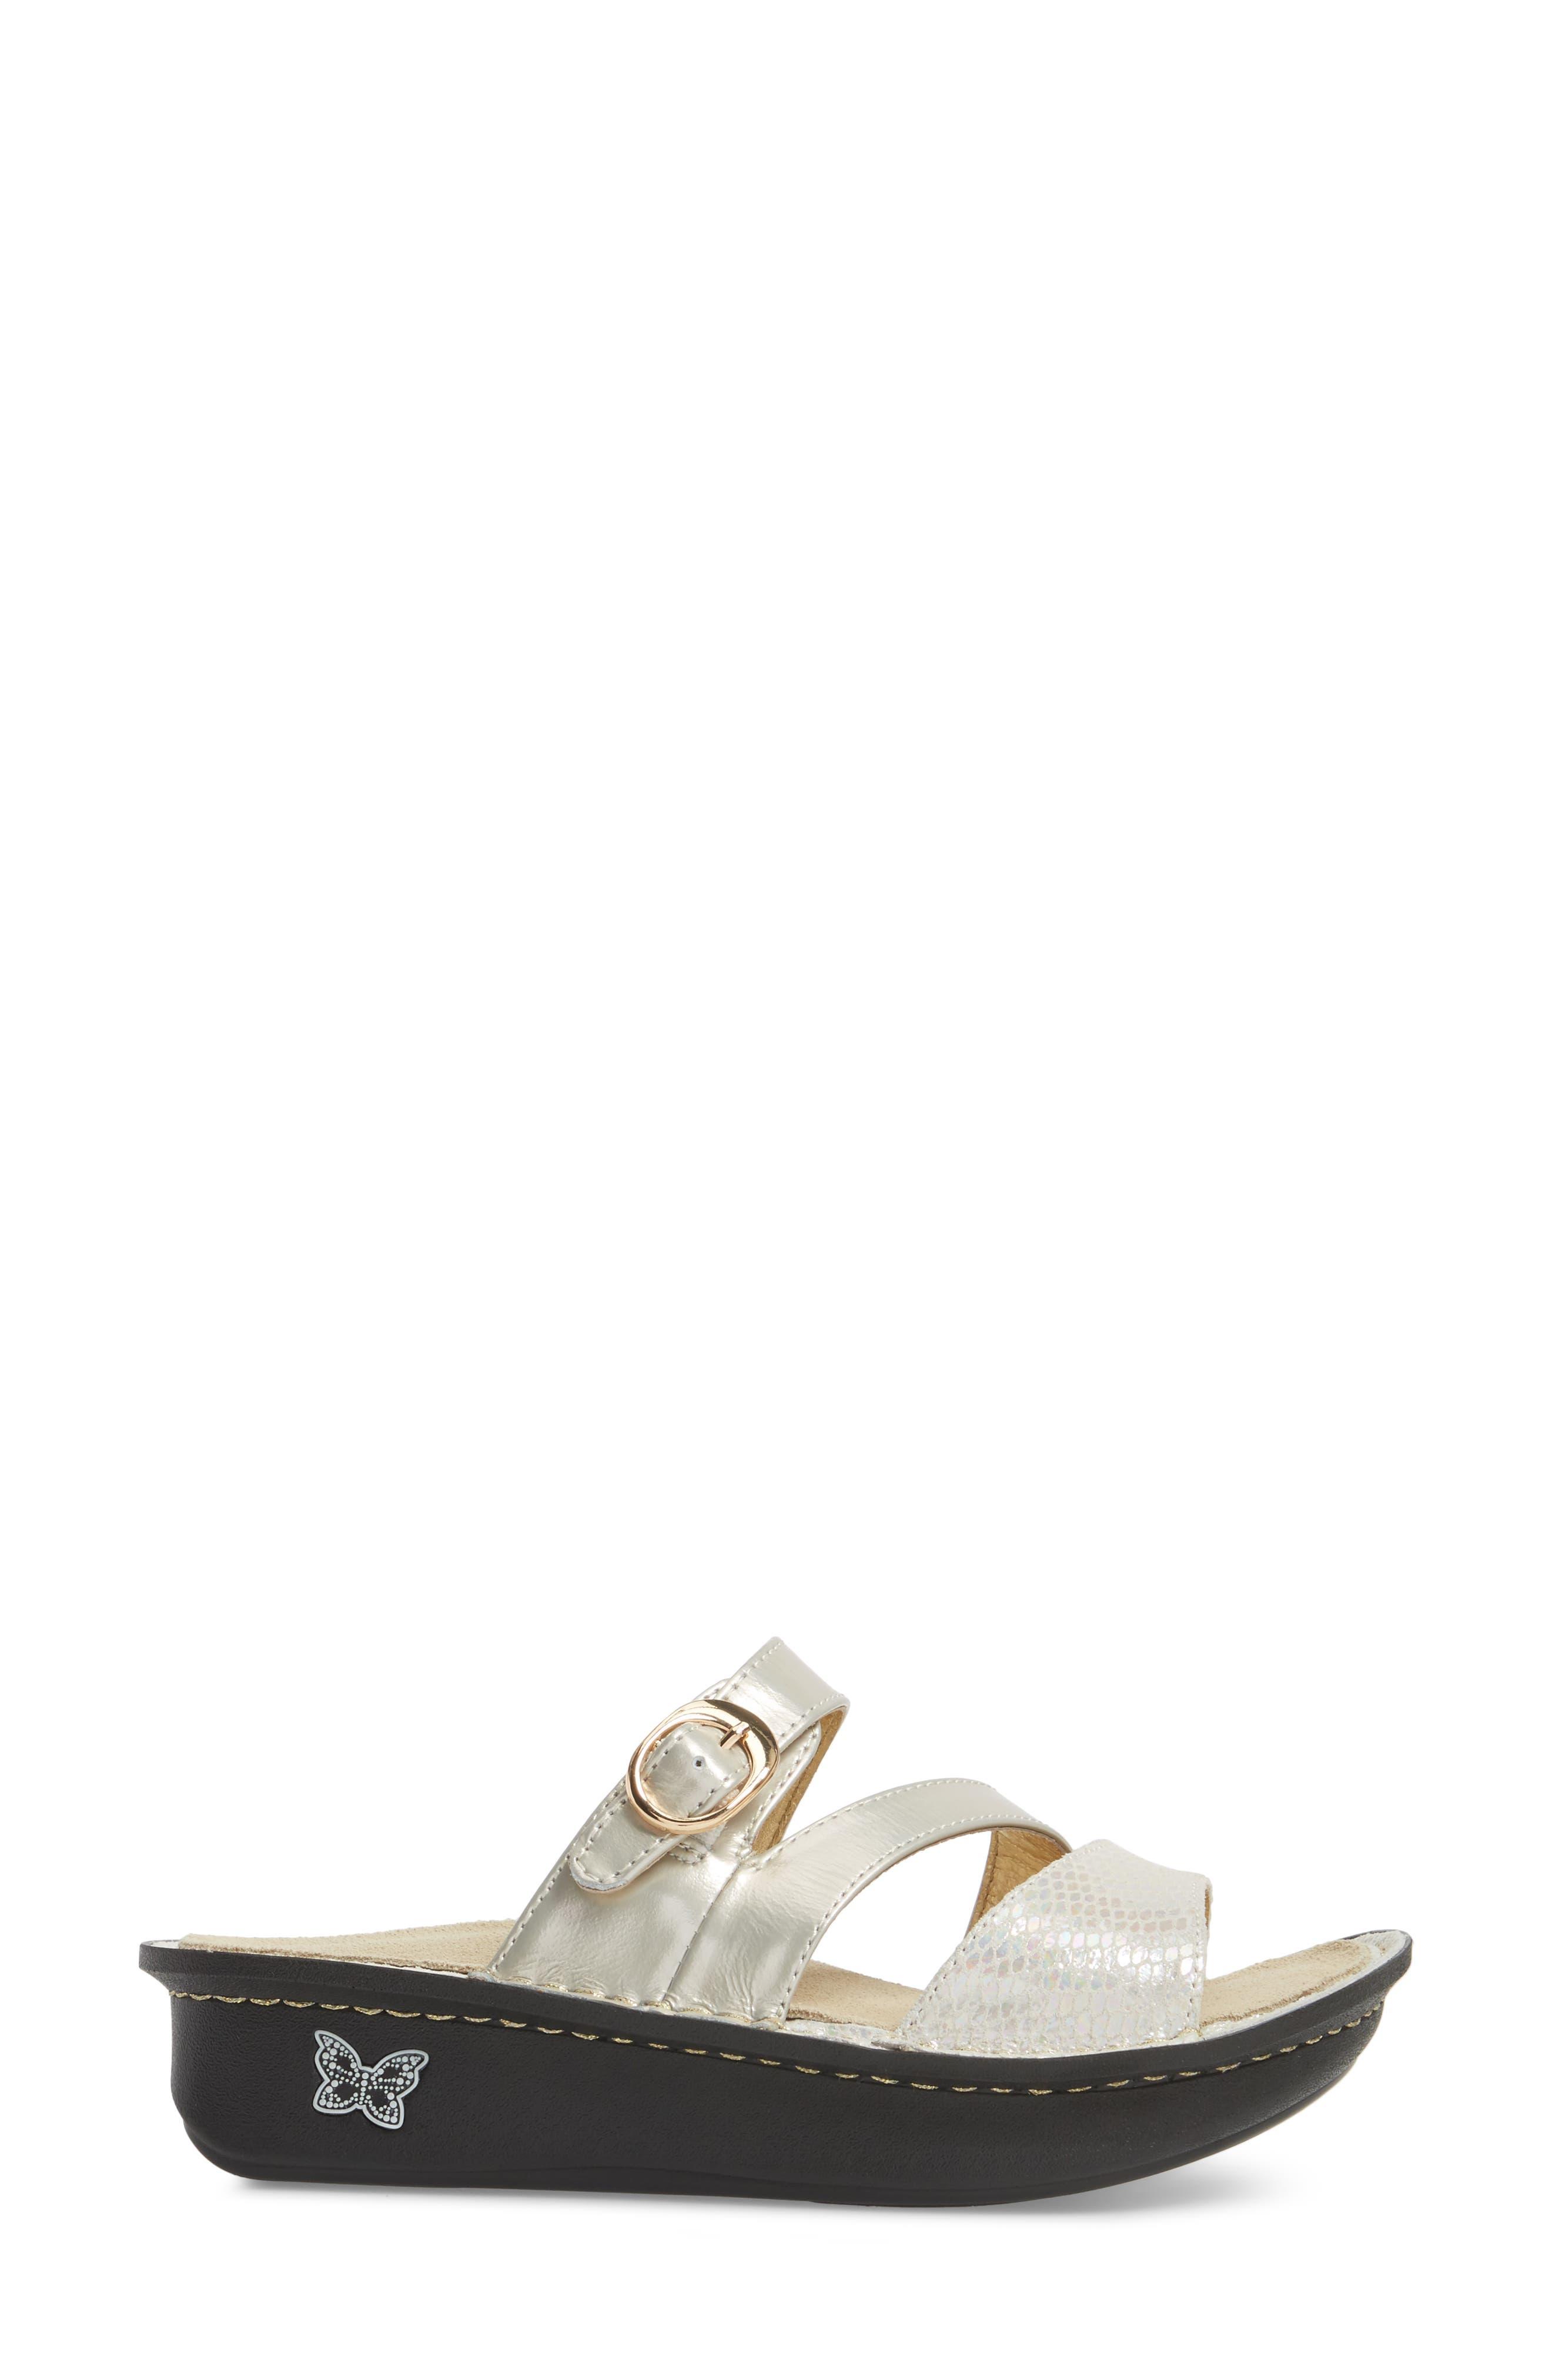 'Colette' Platform Sandal,                             Alternate thumbnail 32, color,